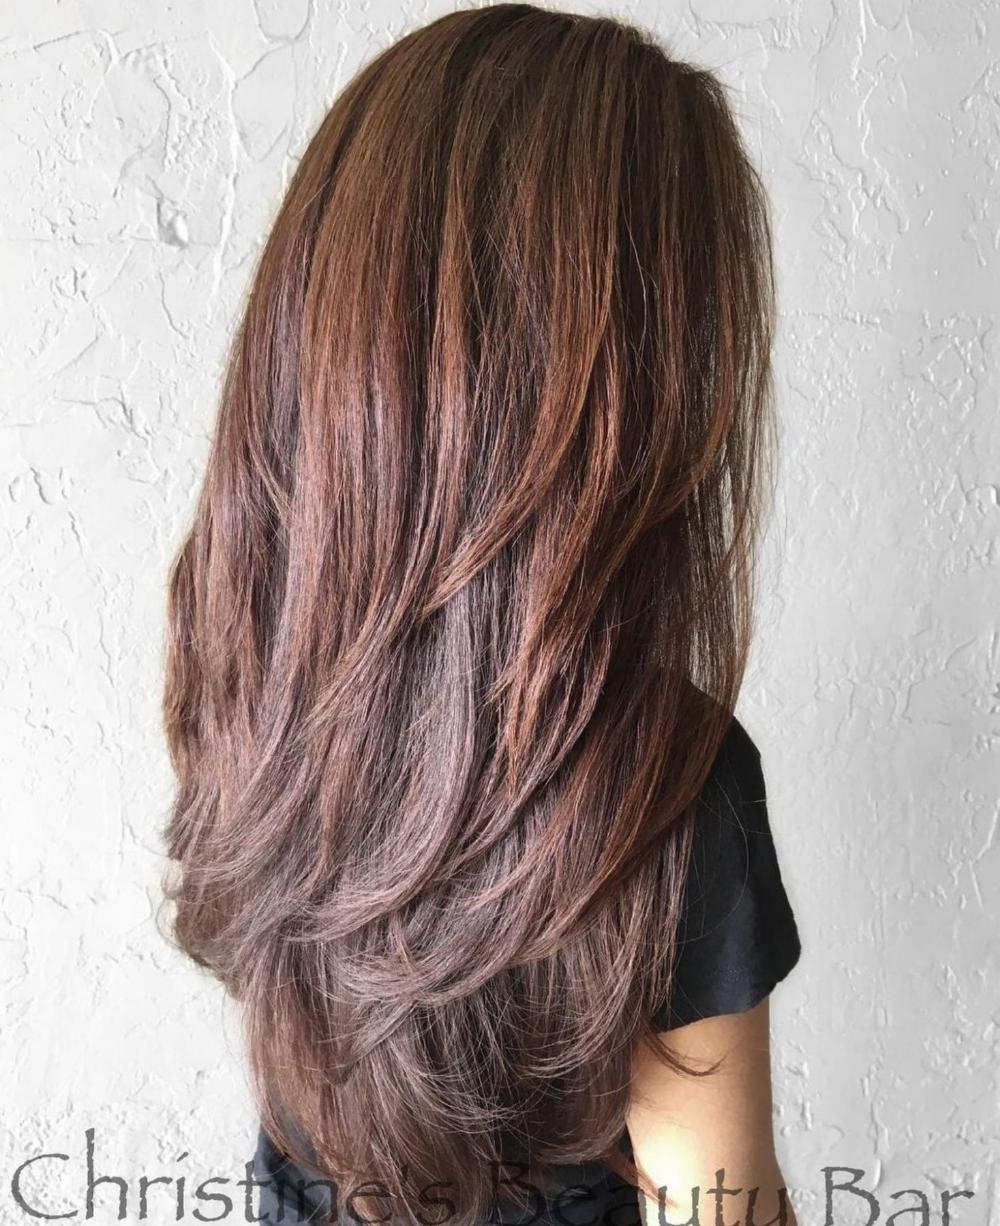 Long Hair Layered Haircuts Google Search In 2020 Haircuts For Long Hair With Layers Haircuts For Long Hair Haircuts For Long Hair Straight